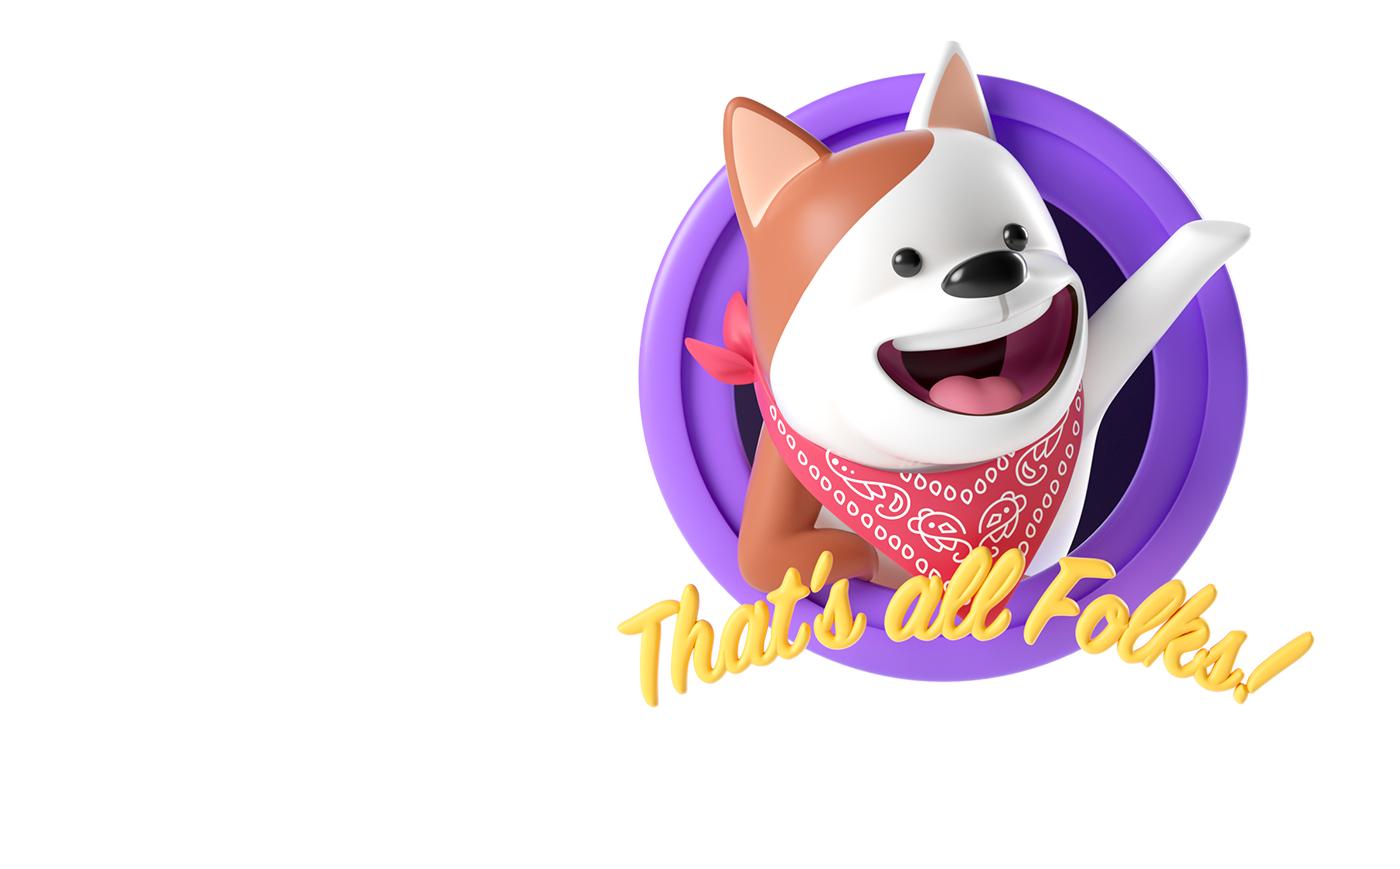 stickers,3D,sticker pack,3d stickers,dog sticker,Render,app stickers,cinema4d,characterdesign,dog